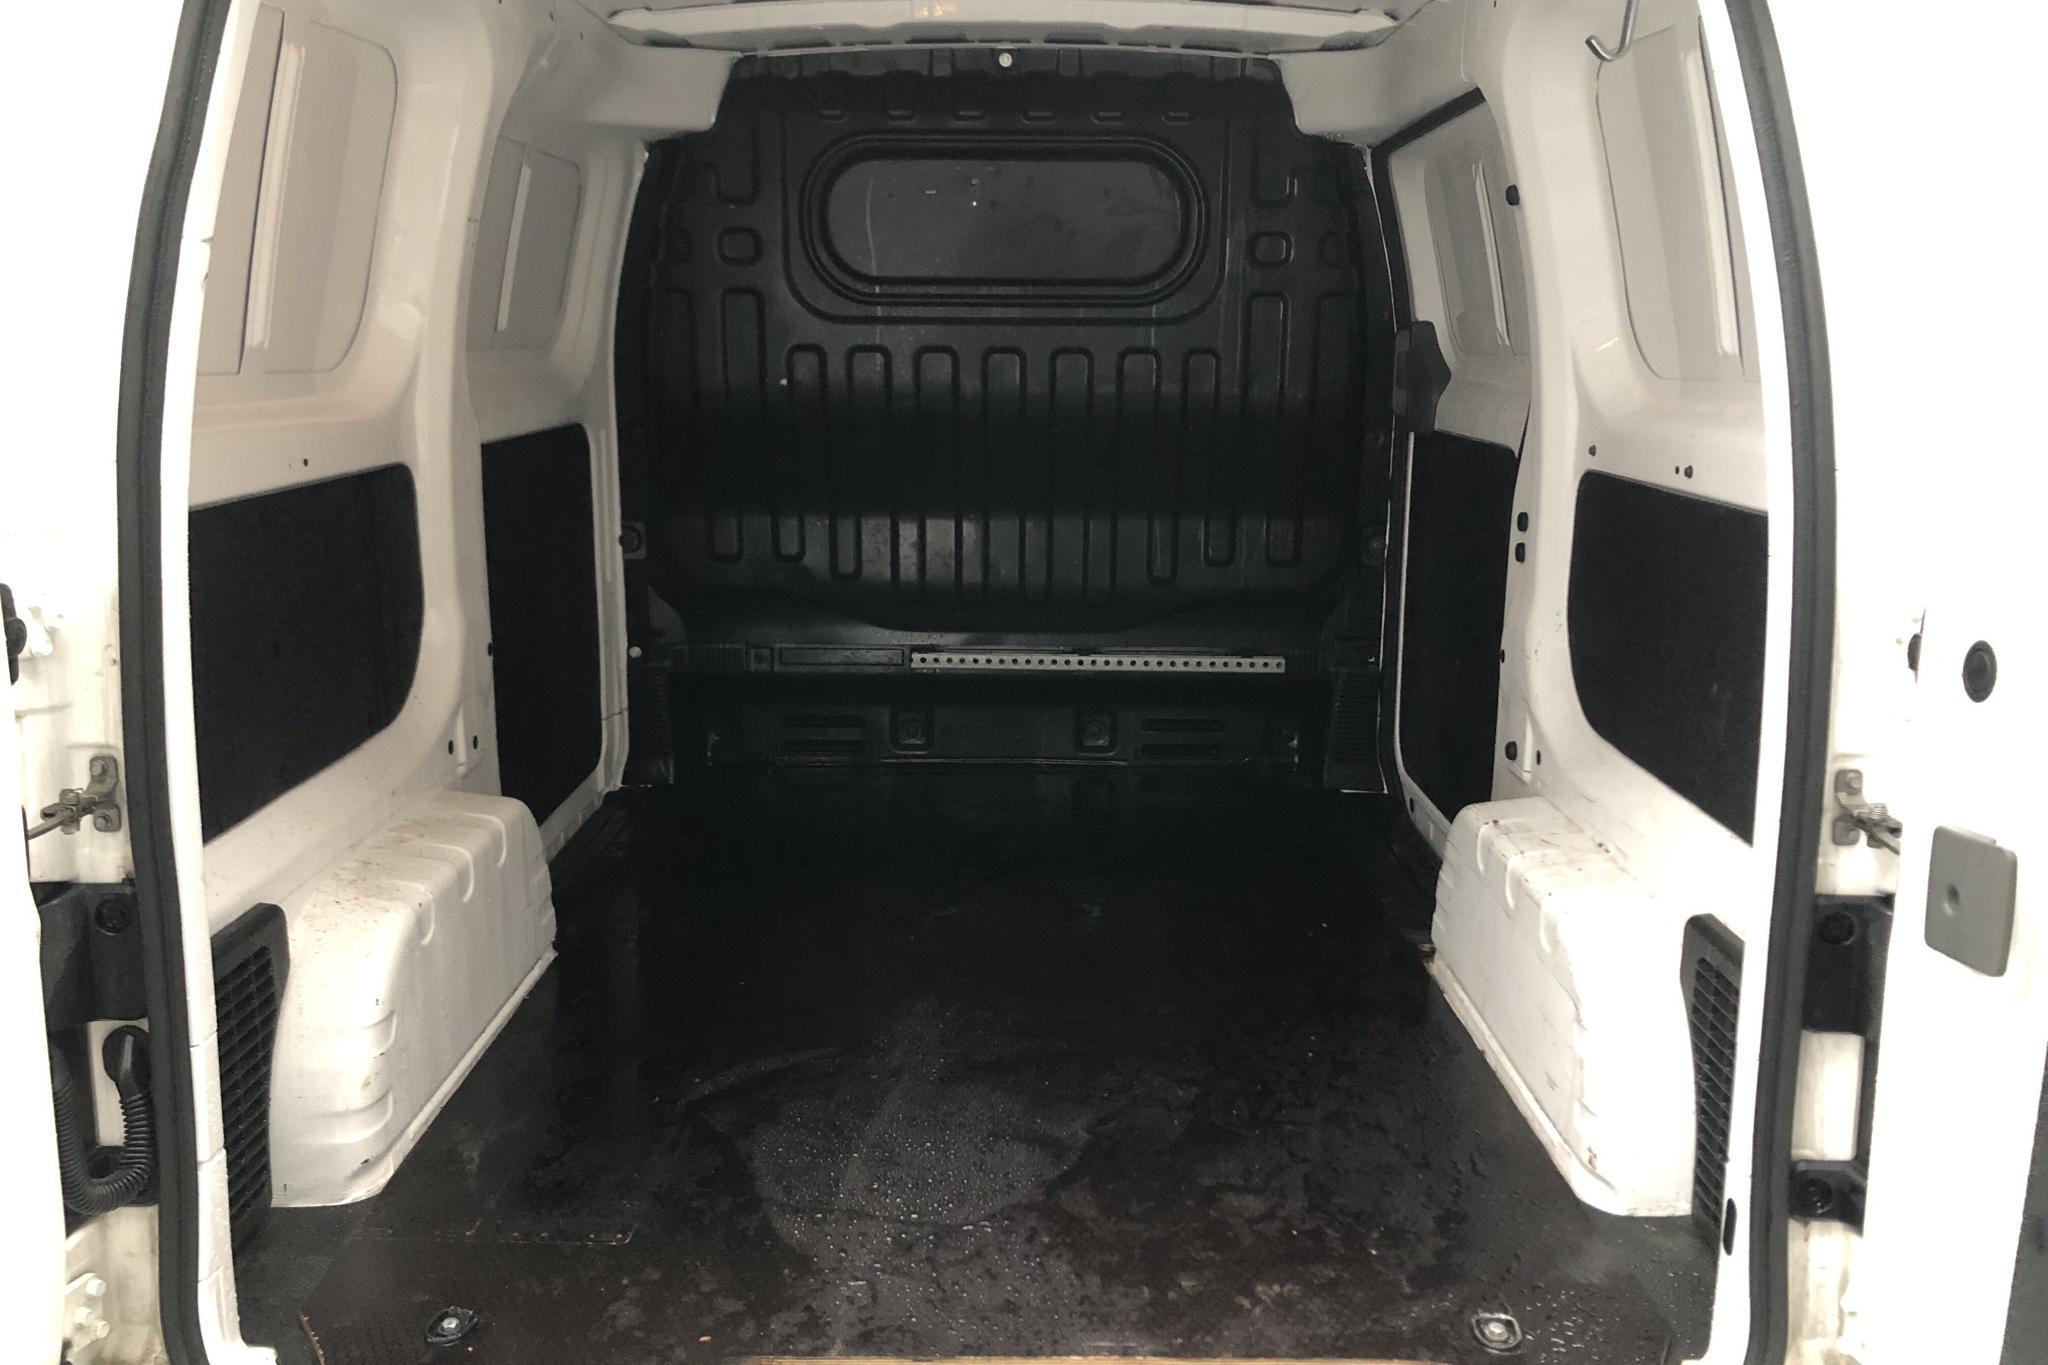 Nissan NV200 1.5 dCi Skåp (110hk) - 37 230 km - Manual - white - 2018